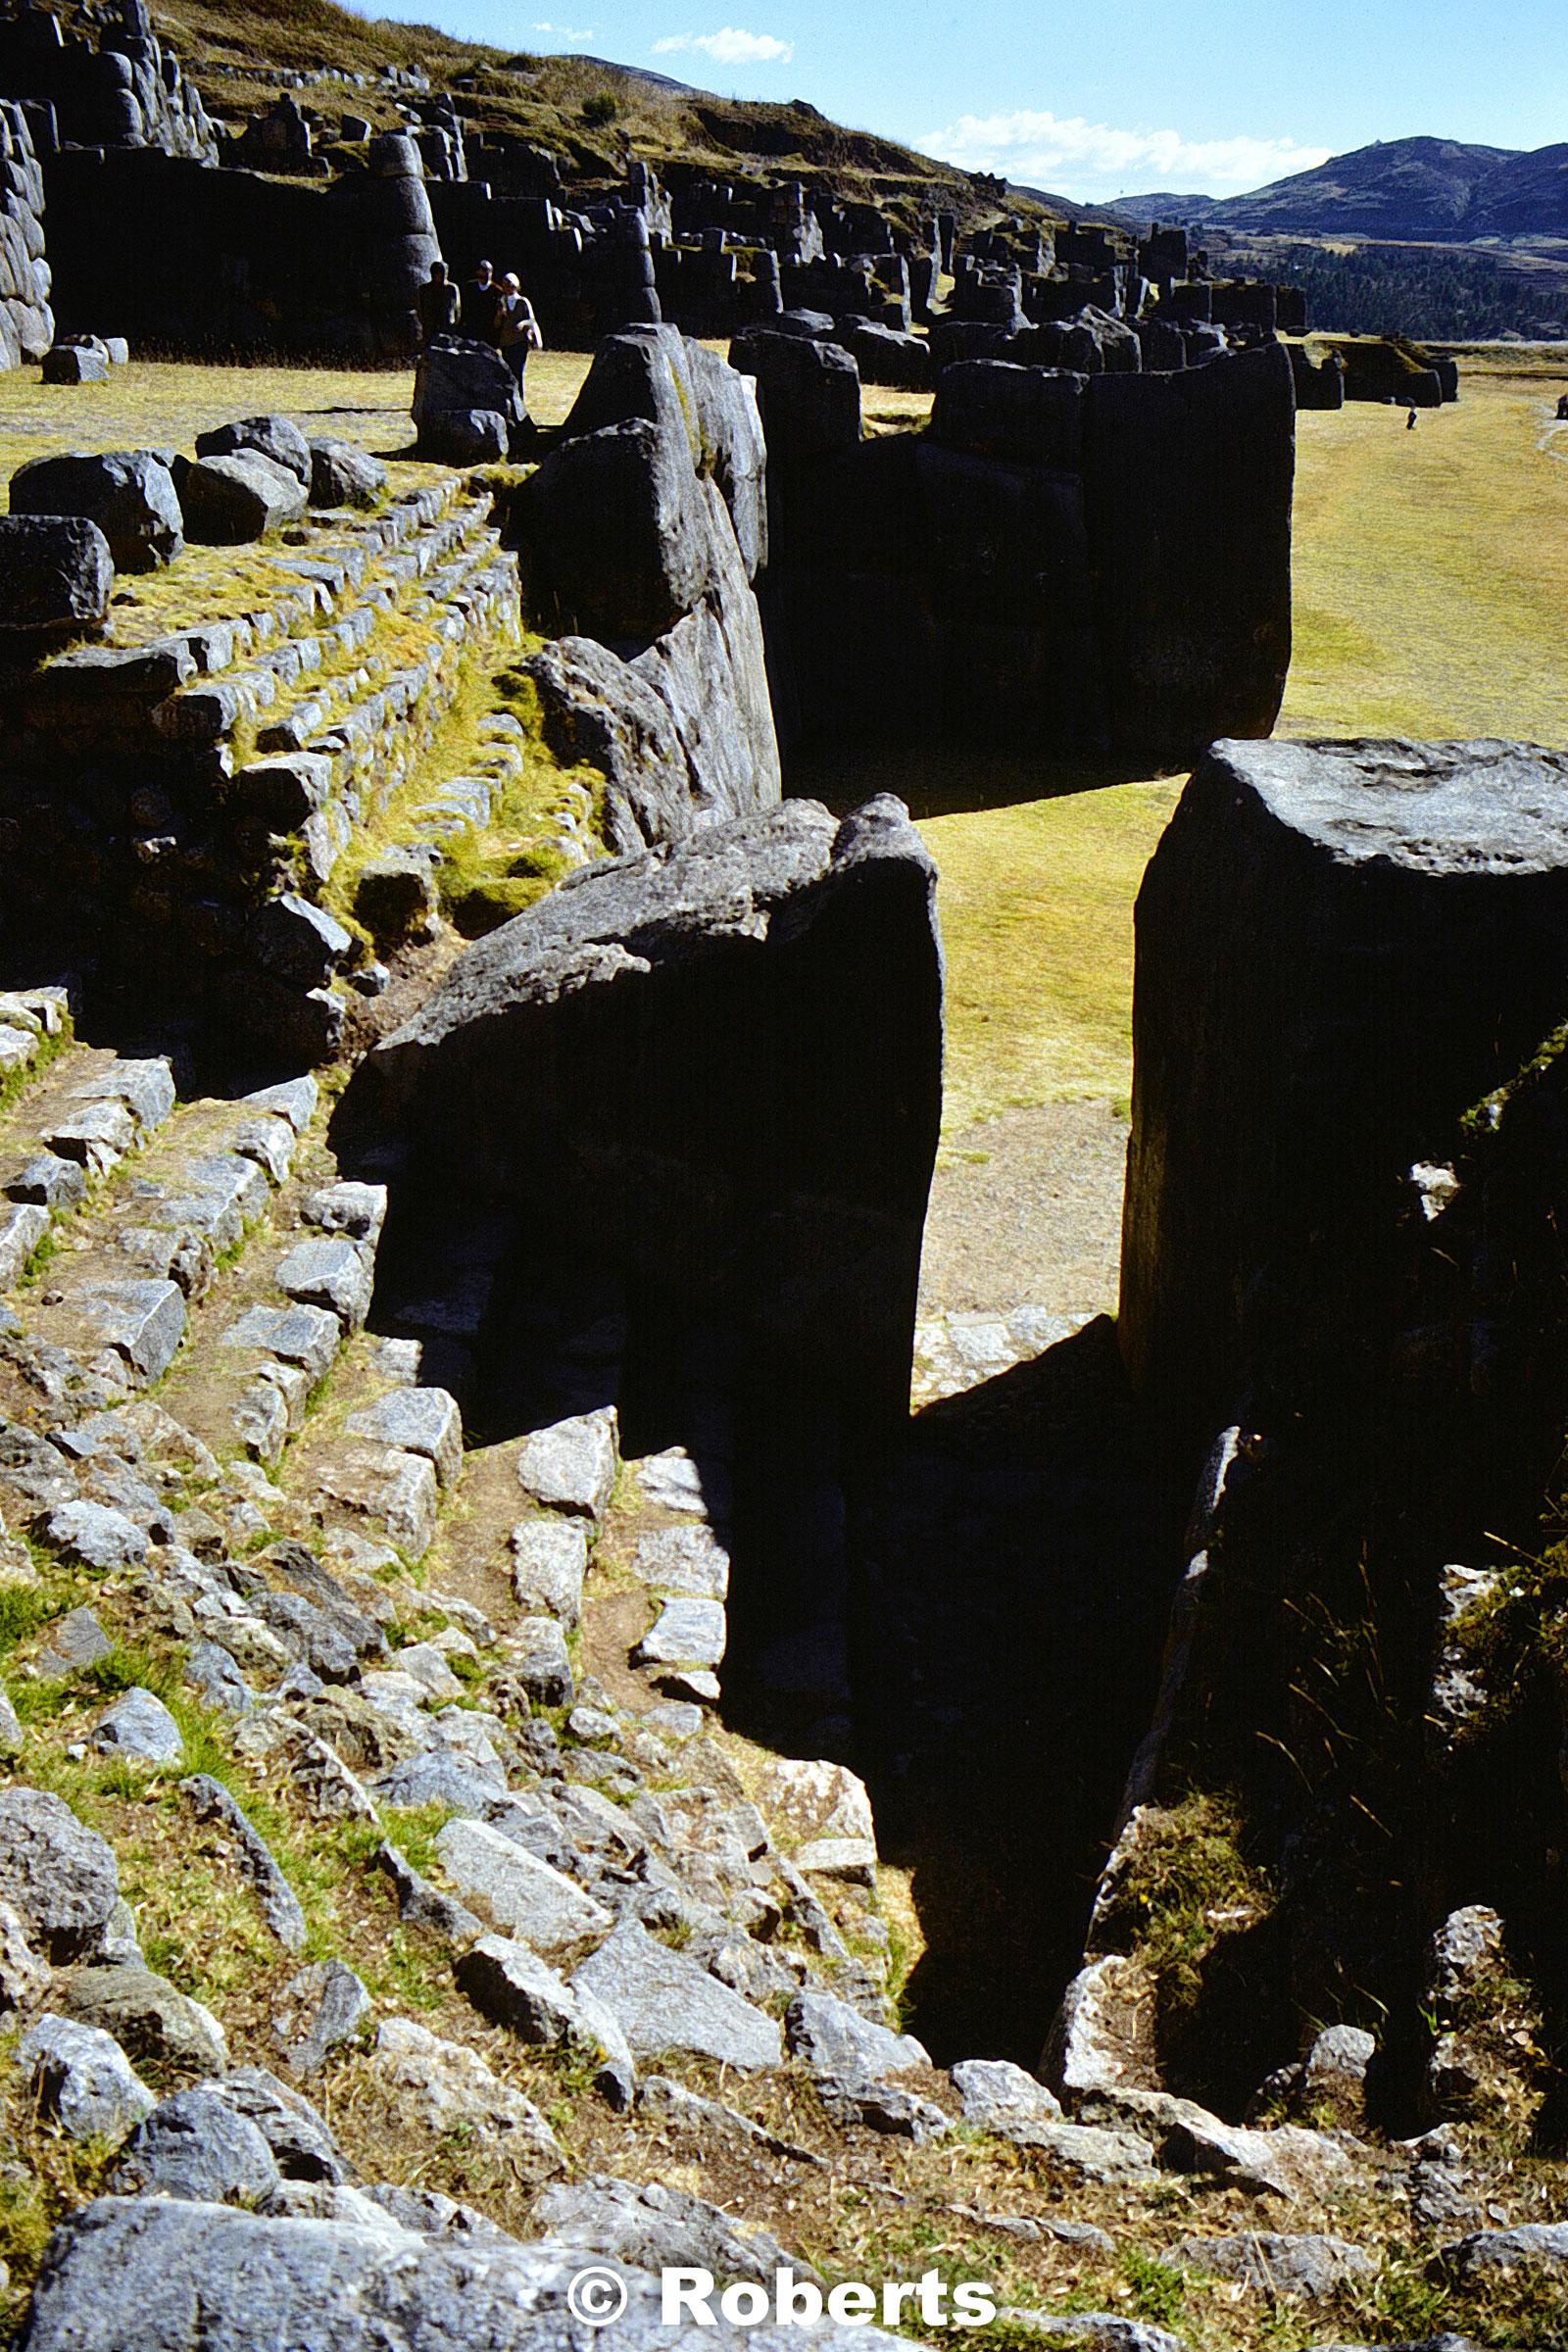 Sacsayhmaman archaeological site. Cusco, Peru. June, 1977.